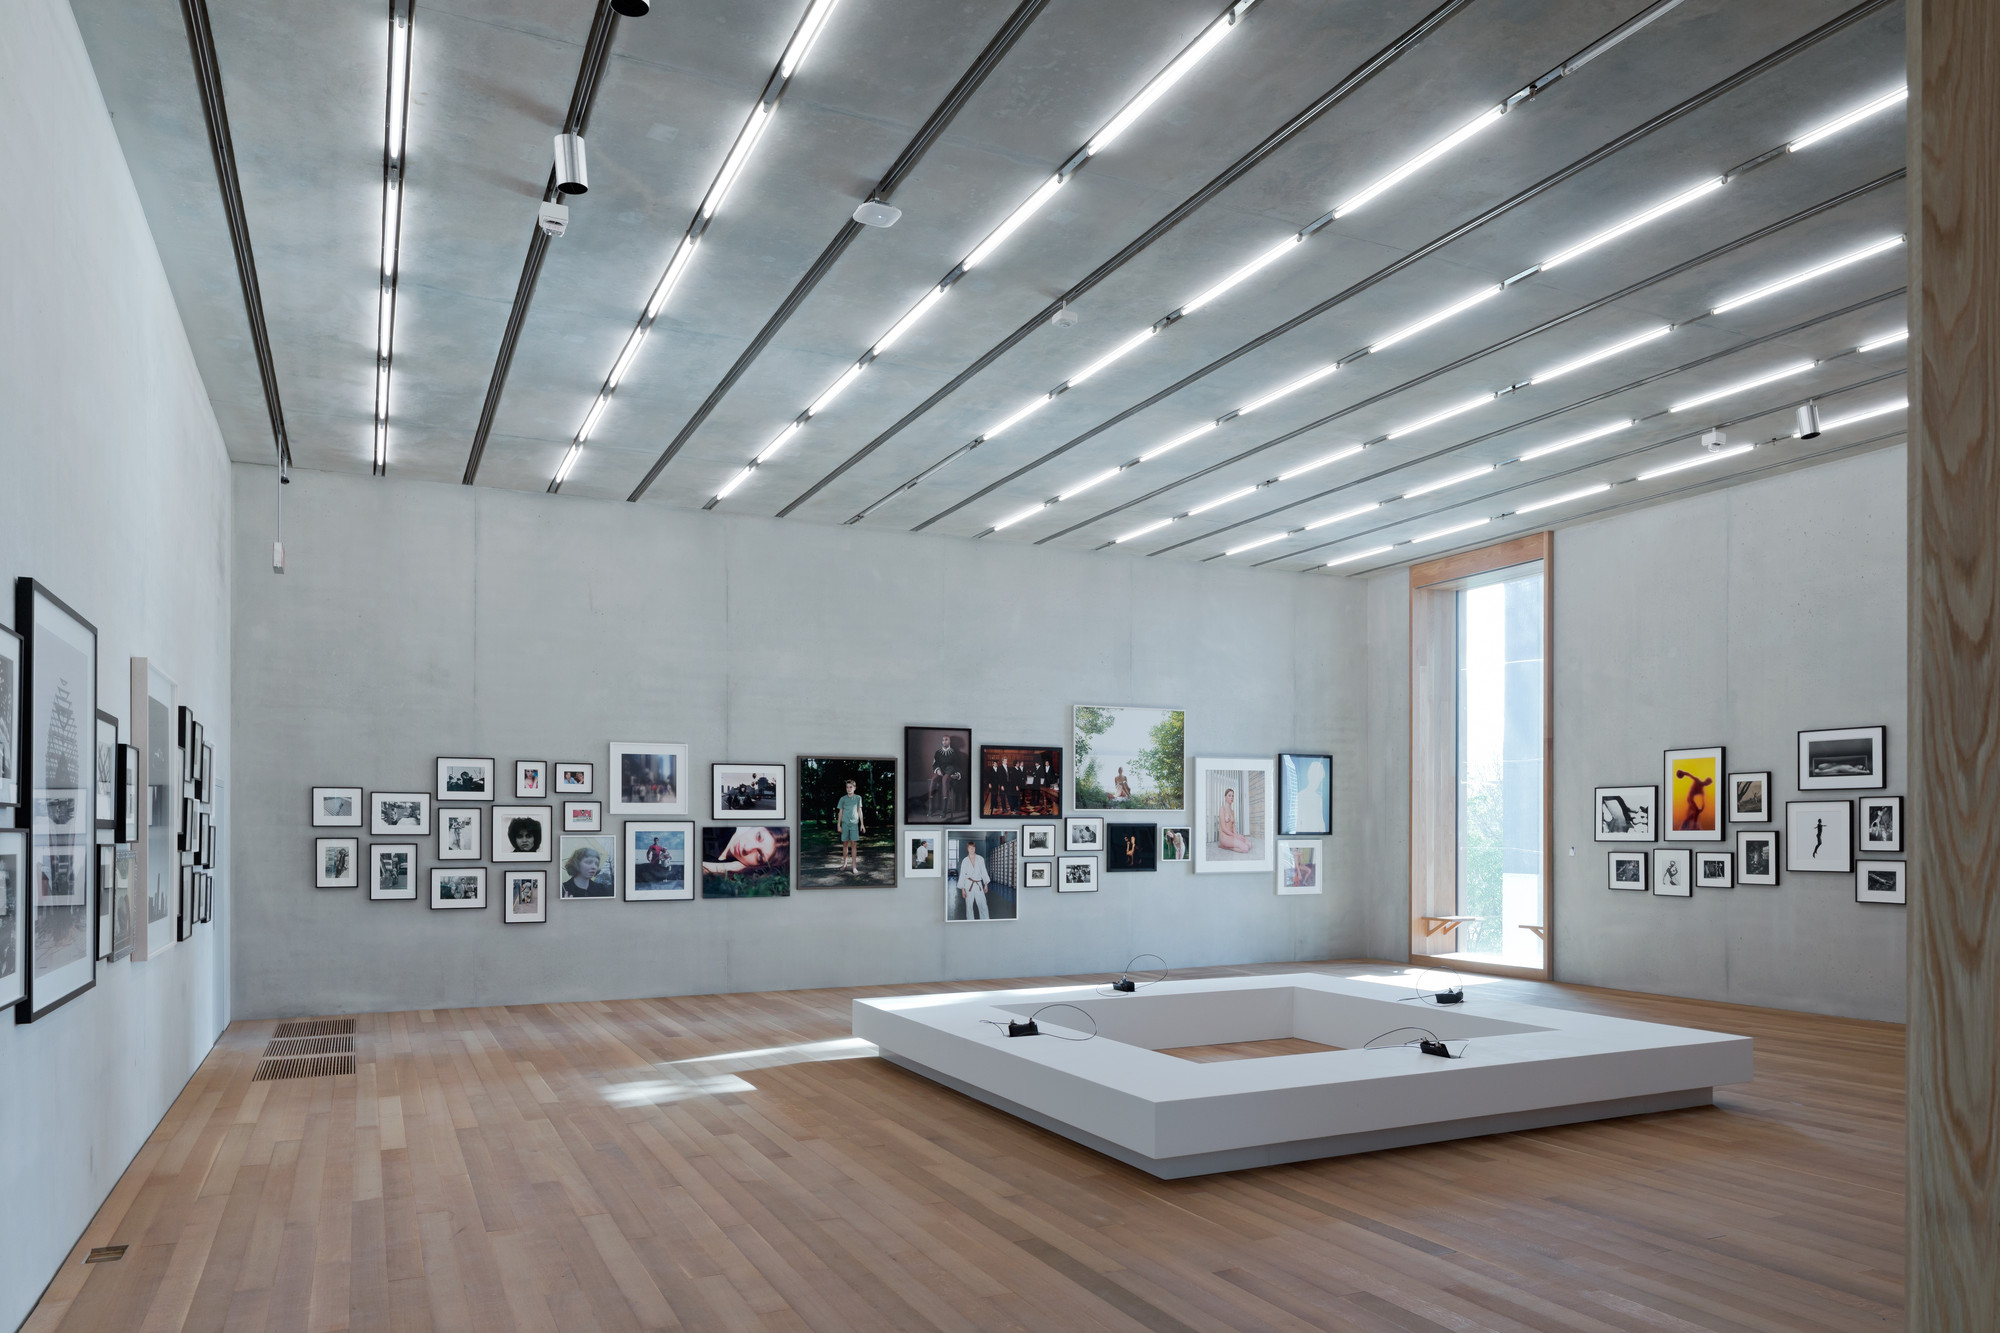 Museum Of Arts And Design Inside : Herzog de meuron celebrates opening of pérez art museum